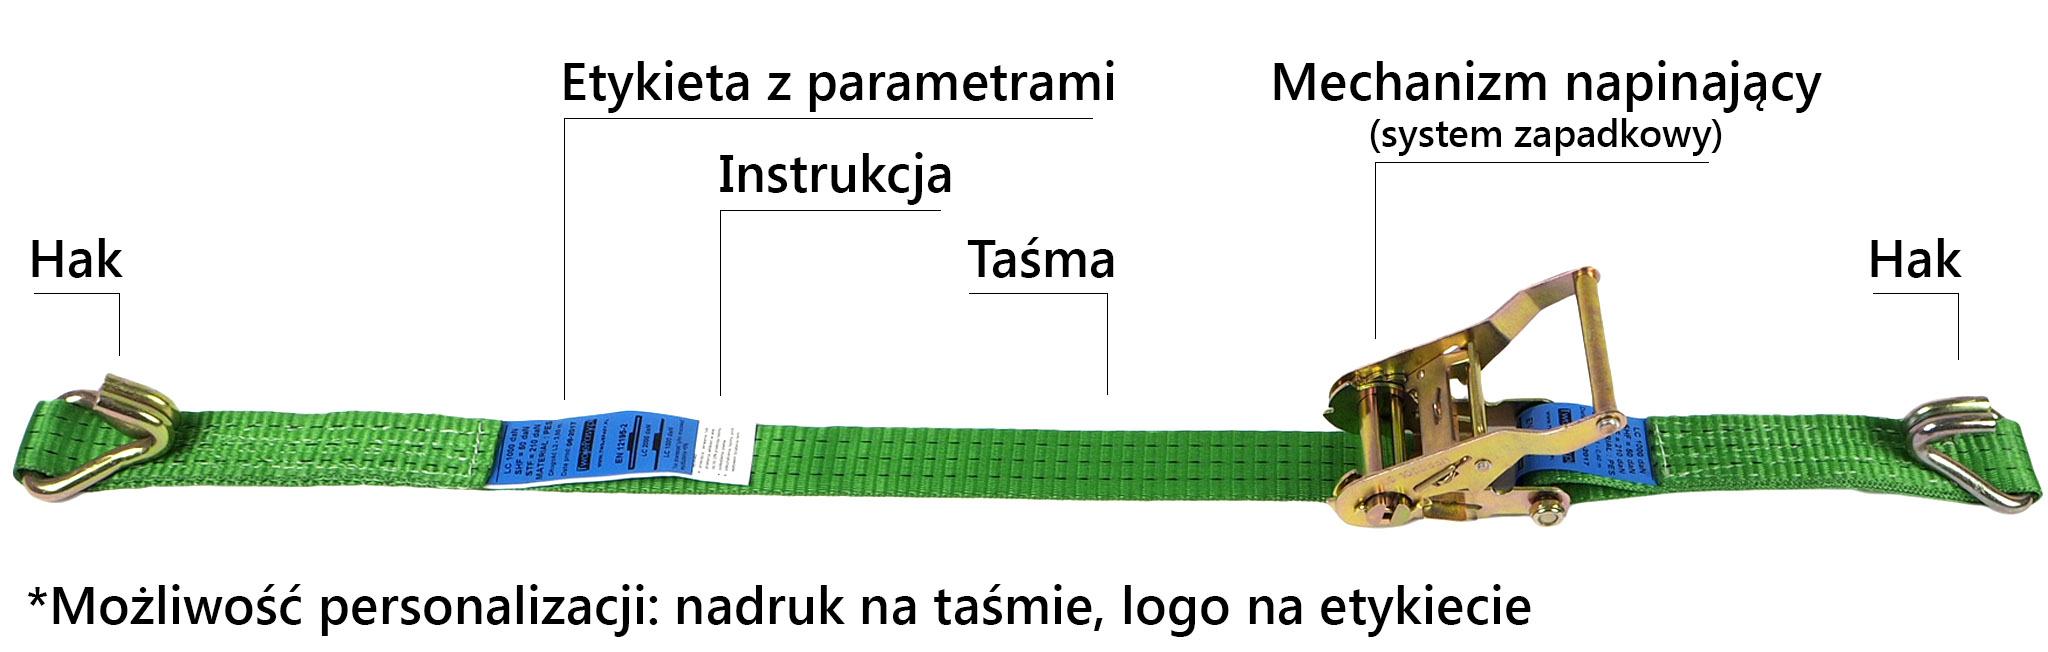 Pas transportowy 2 tony 210 daN